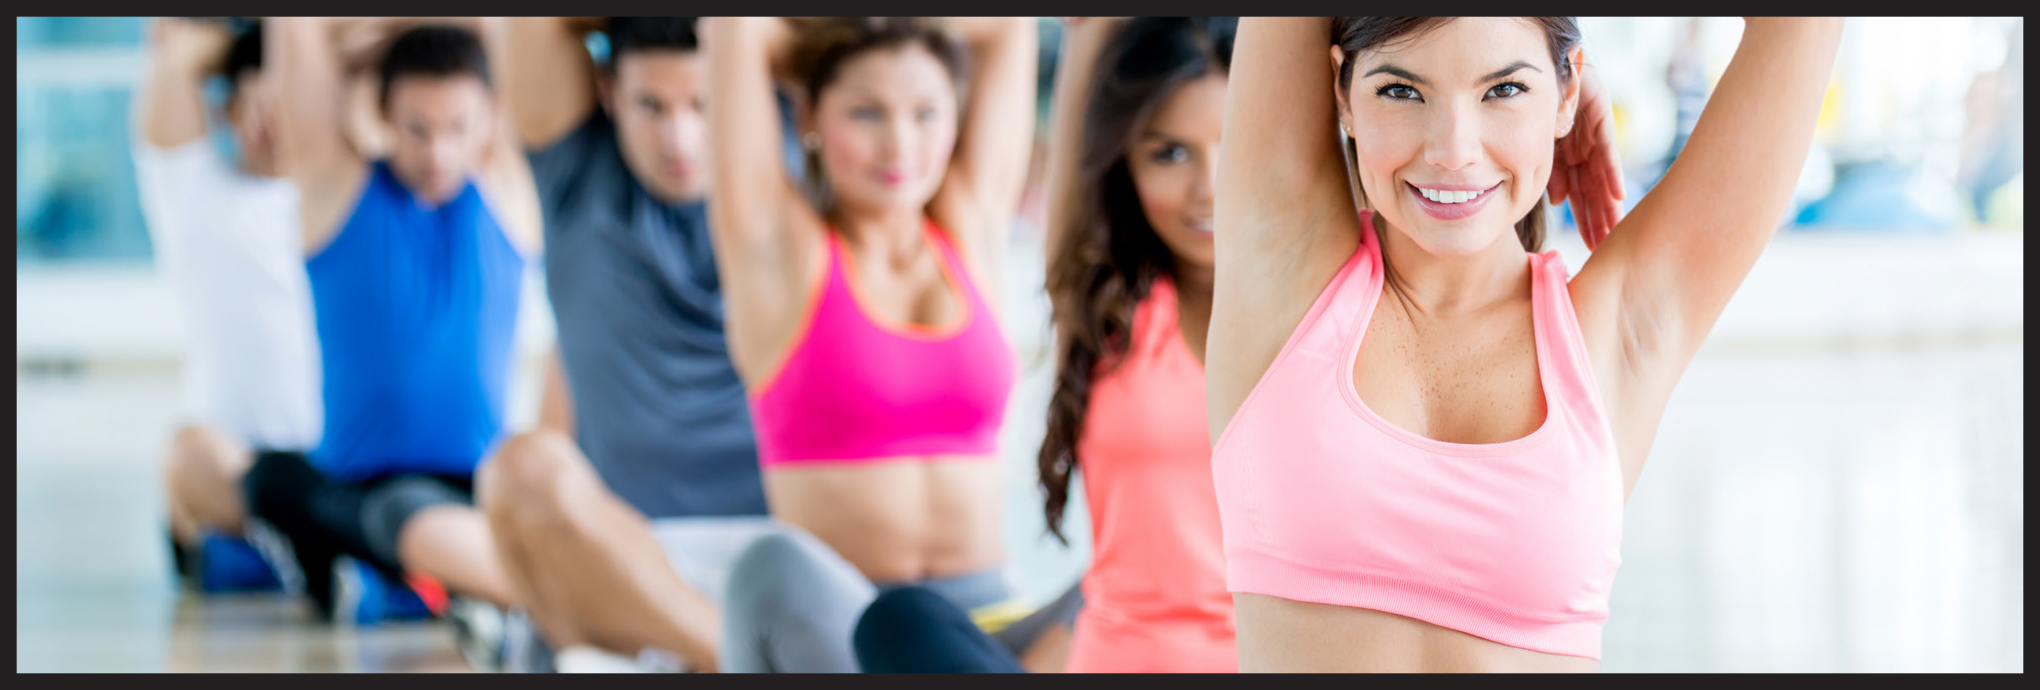 2014 wellness trends